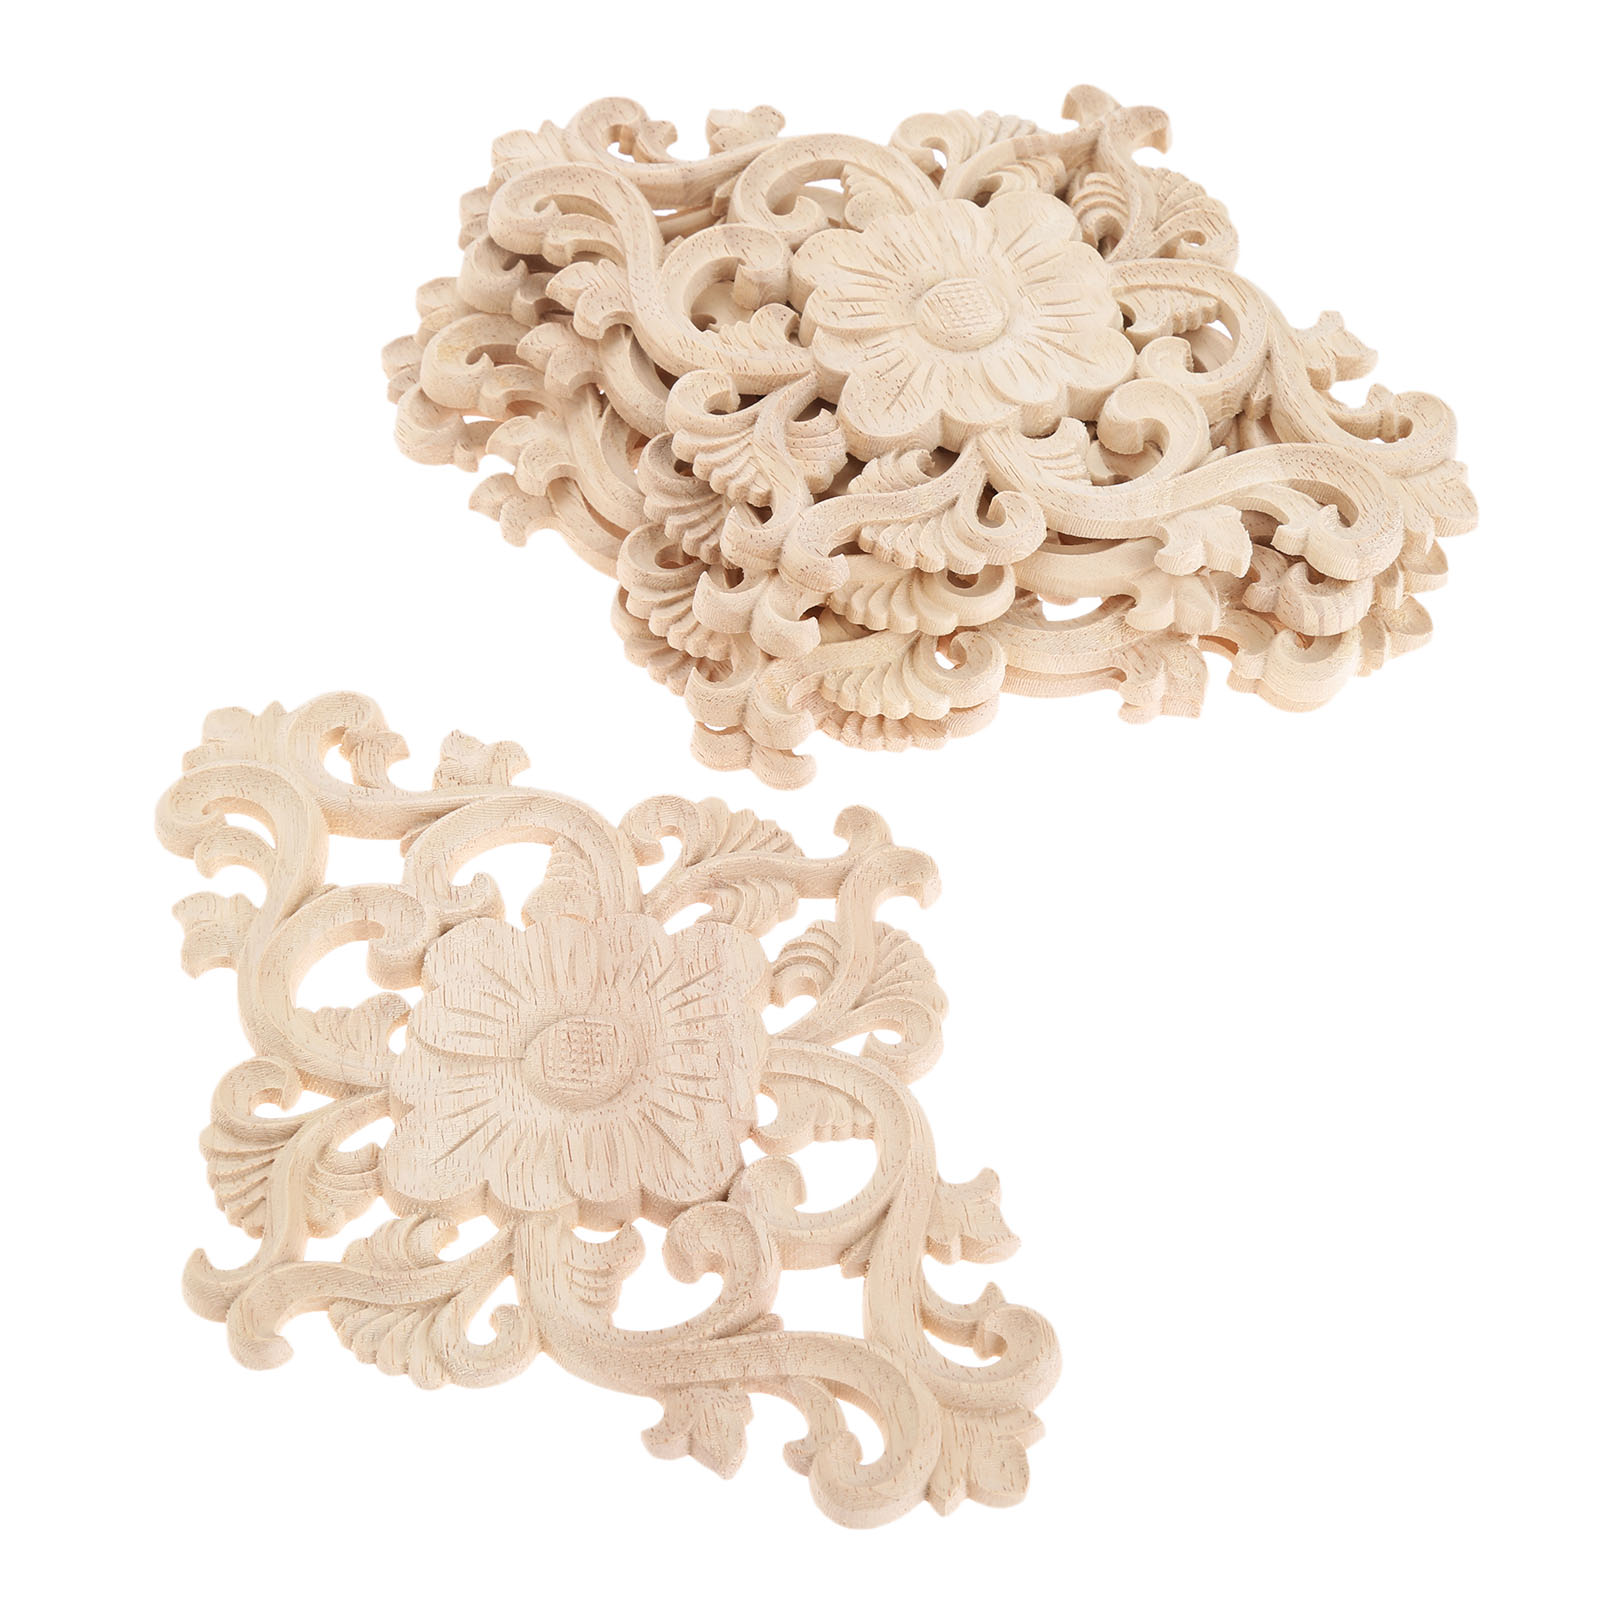 W68 10 x Plain Wooden Medium Circle Craft Shape Blank Emblishment Decoration